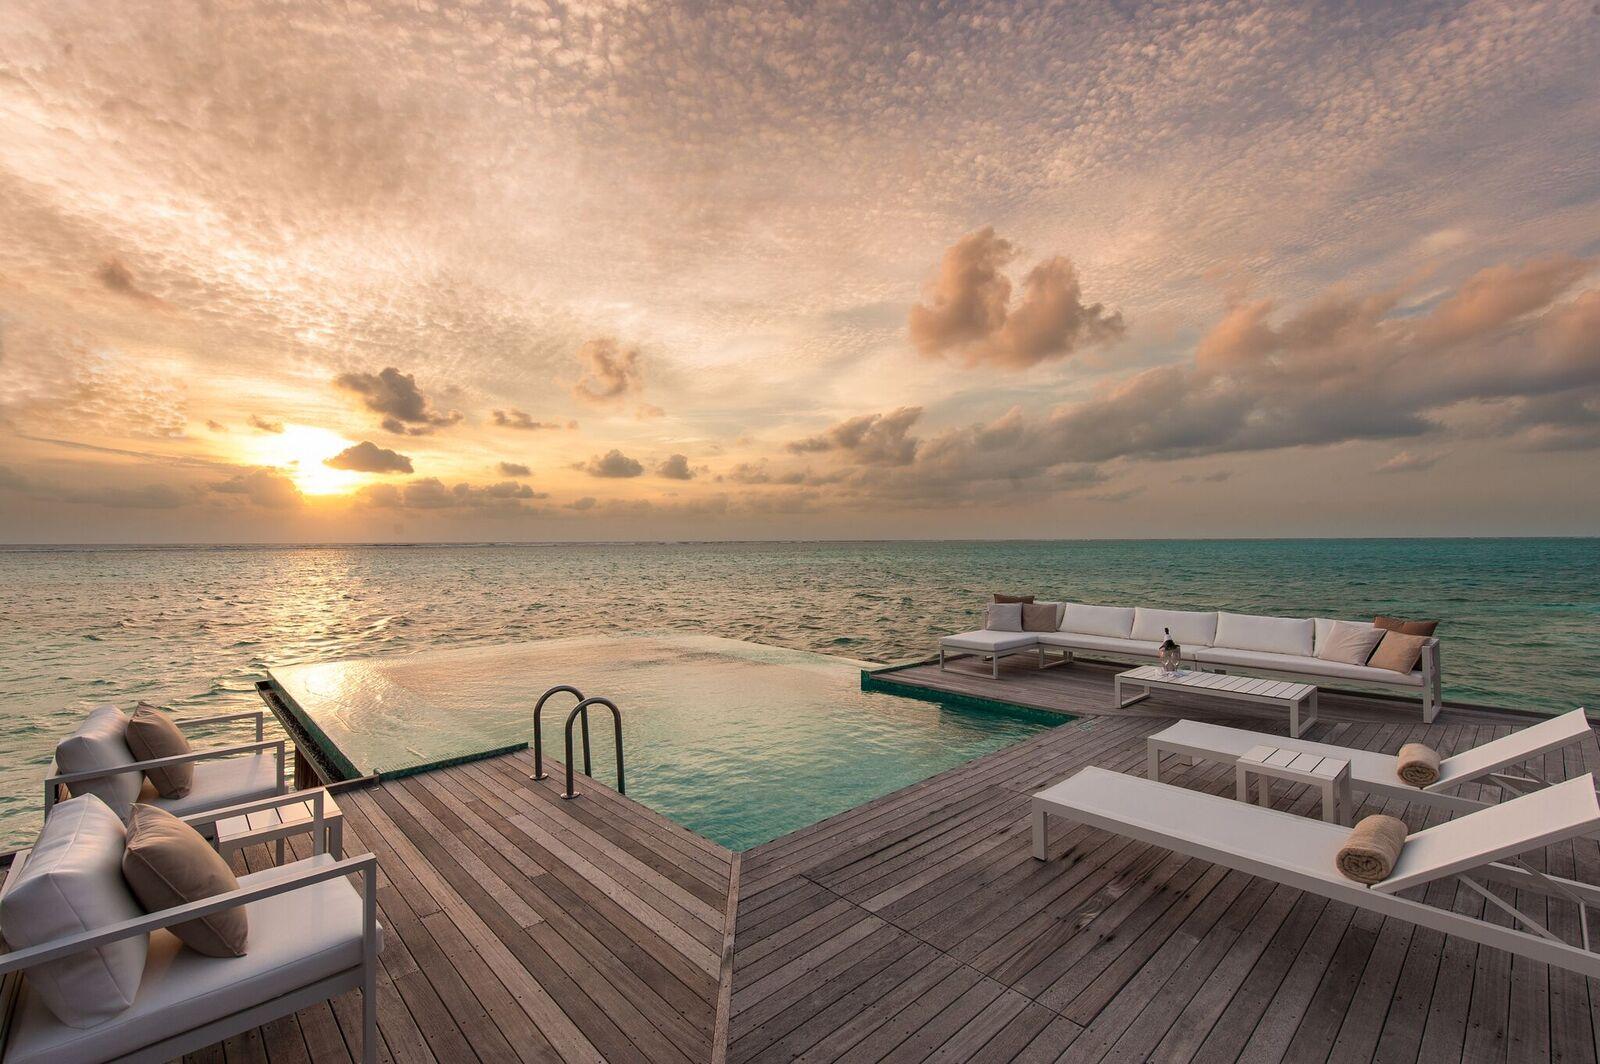 cmri_sunset-water-villa-deck-sunrise